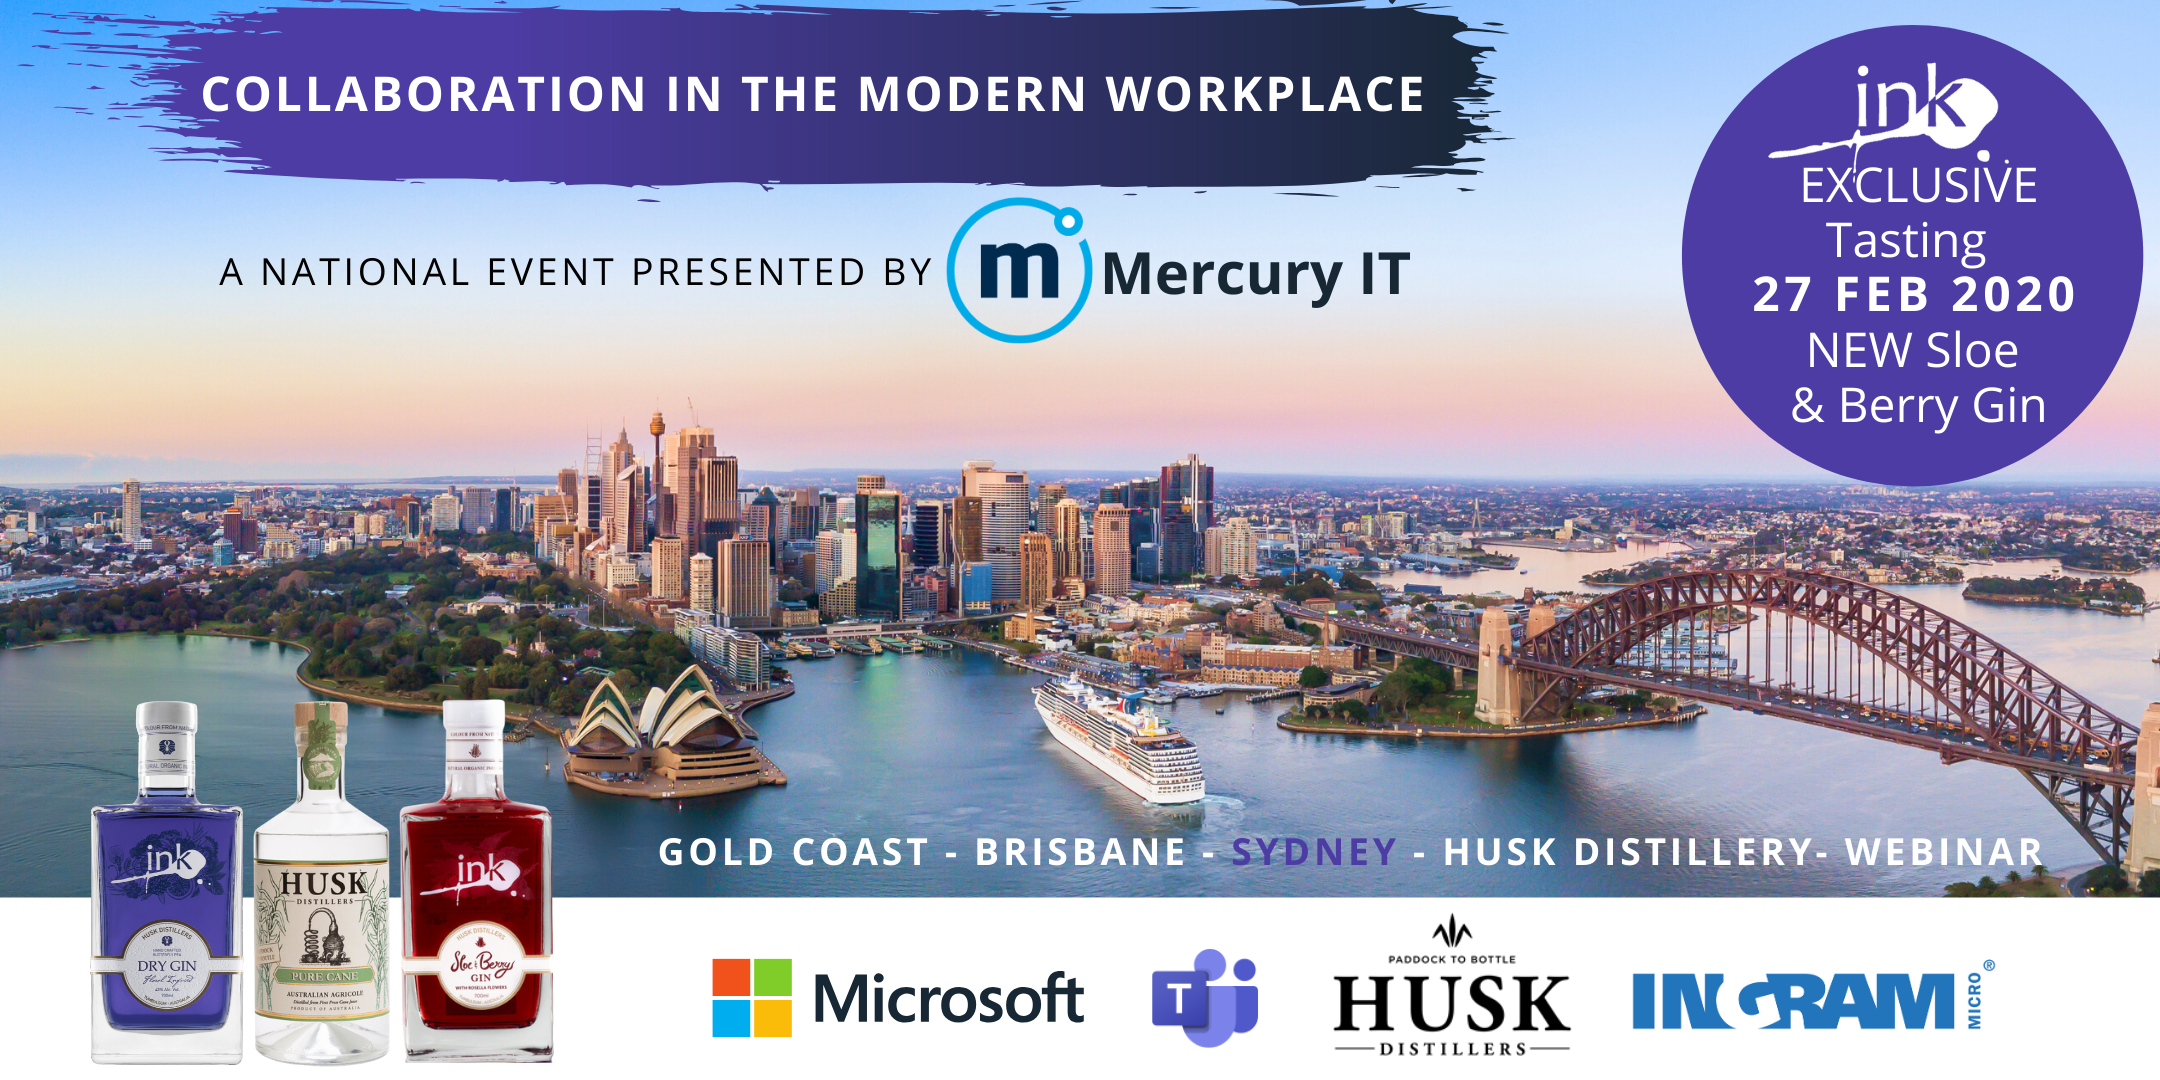 Collaboration in the Modern Workplace with Microsoft - Sydney & Webinar 27FEB20